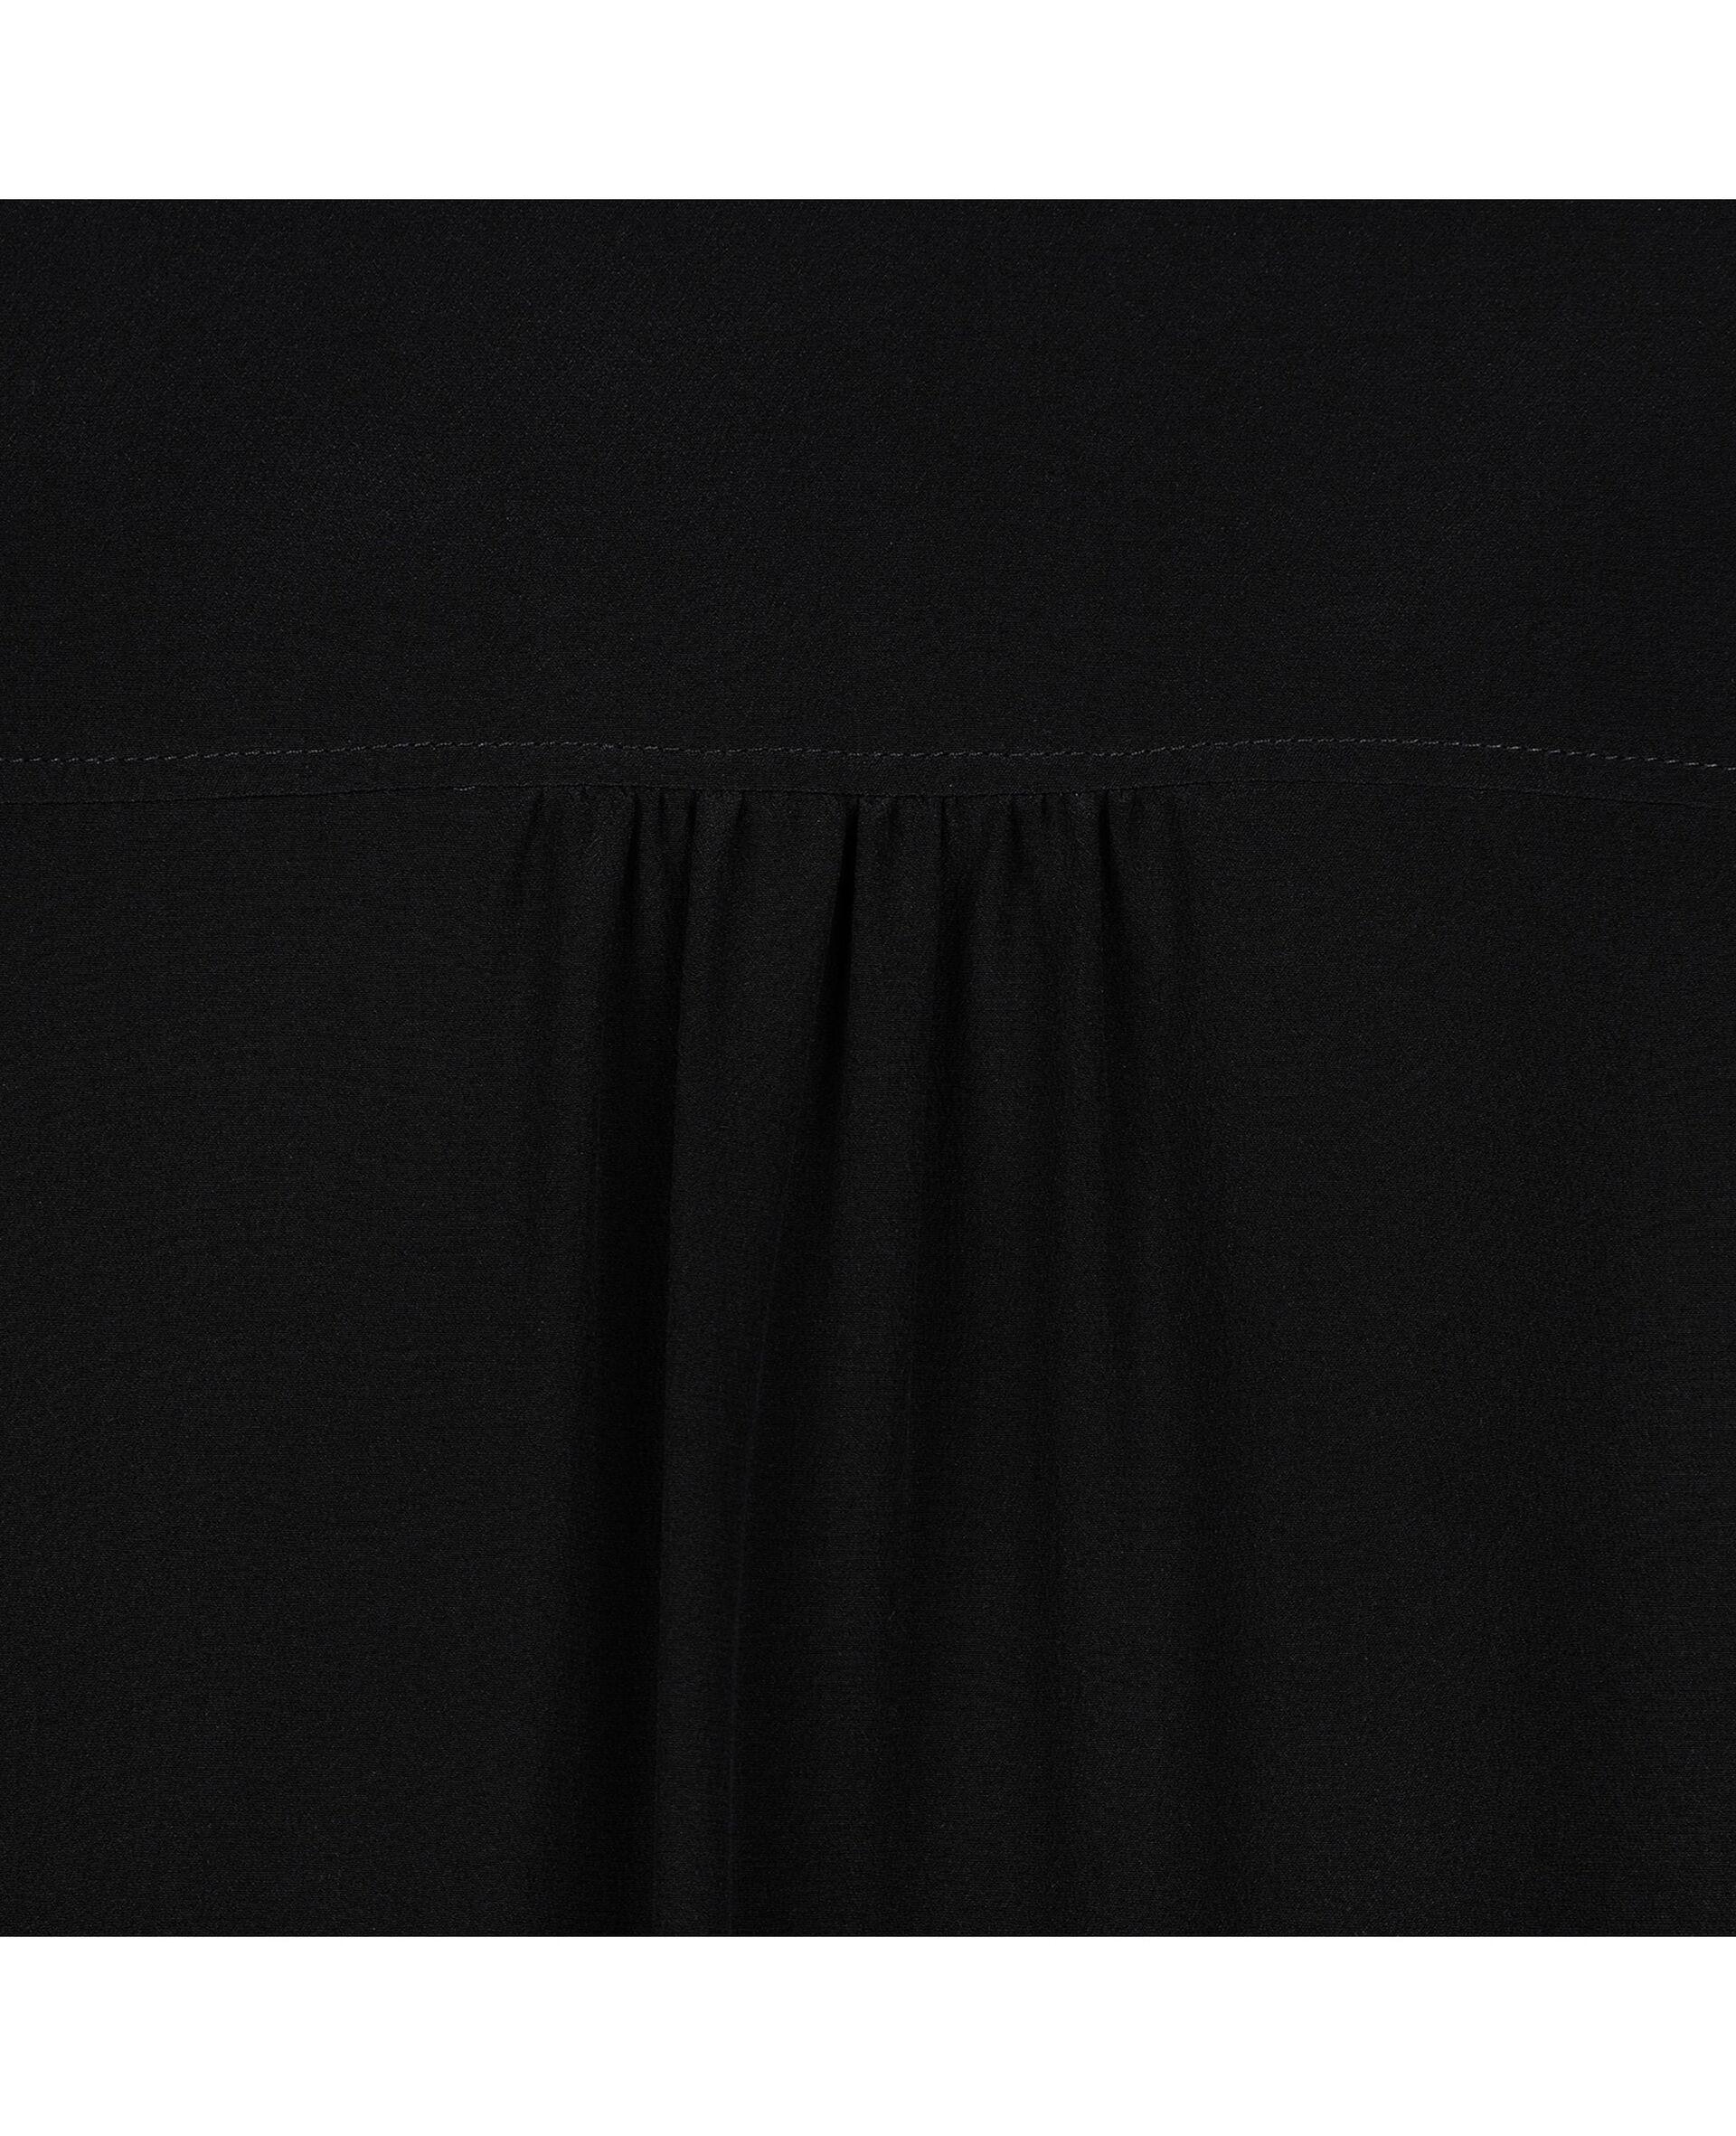 Estelle 衬衫-黑色-large image number 2